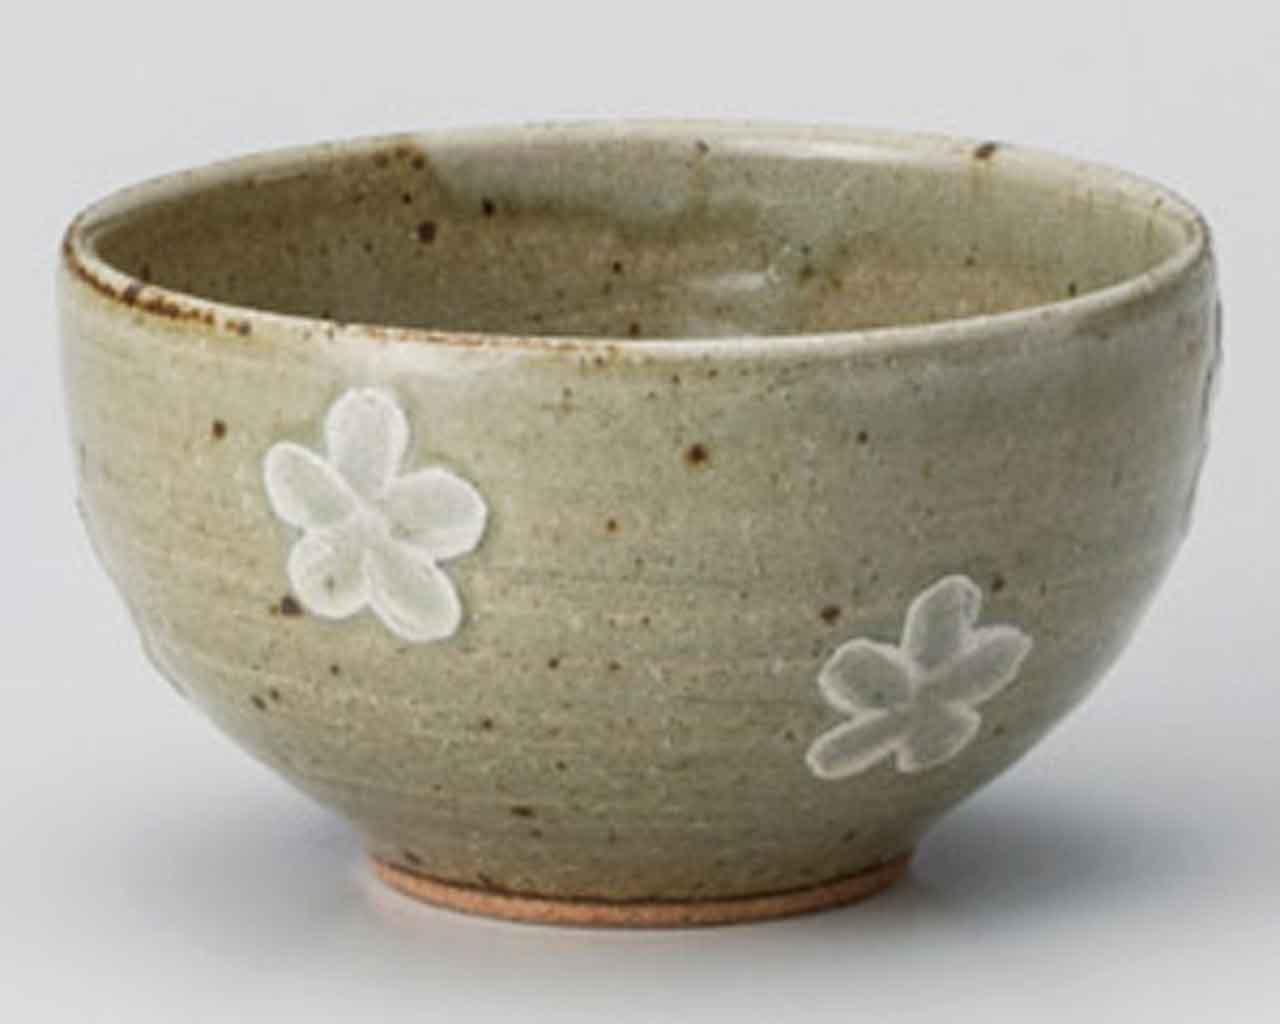 Kahori 4.7inch Set of 10 Rice bowls Ceramic Made in Japan